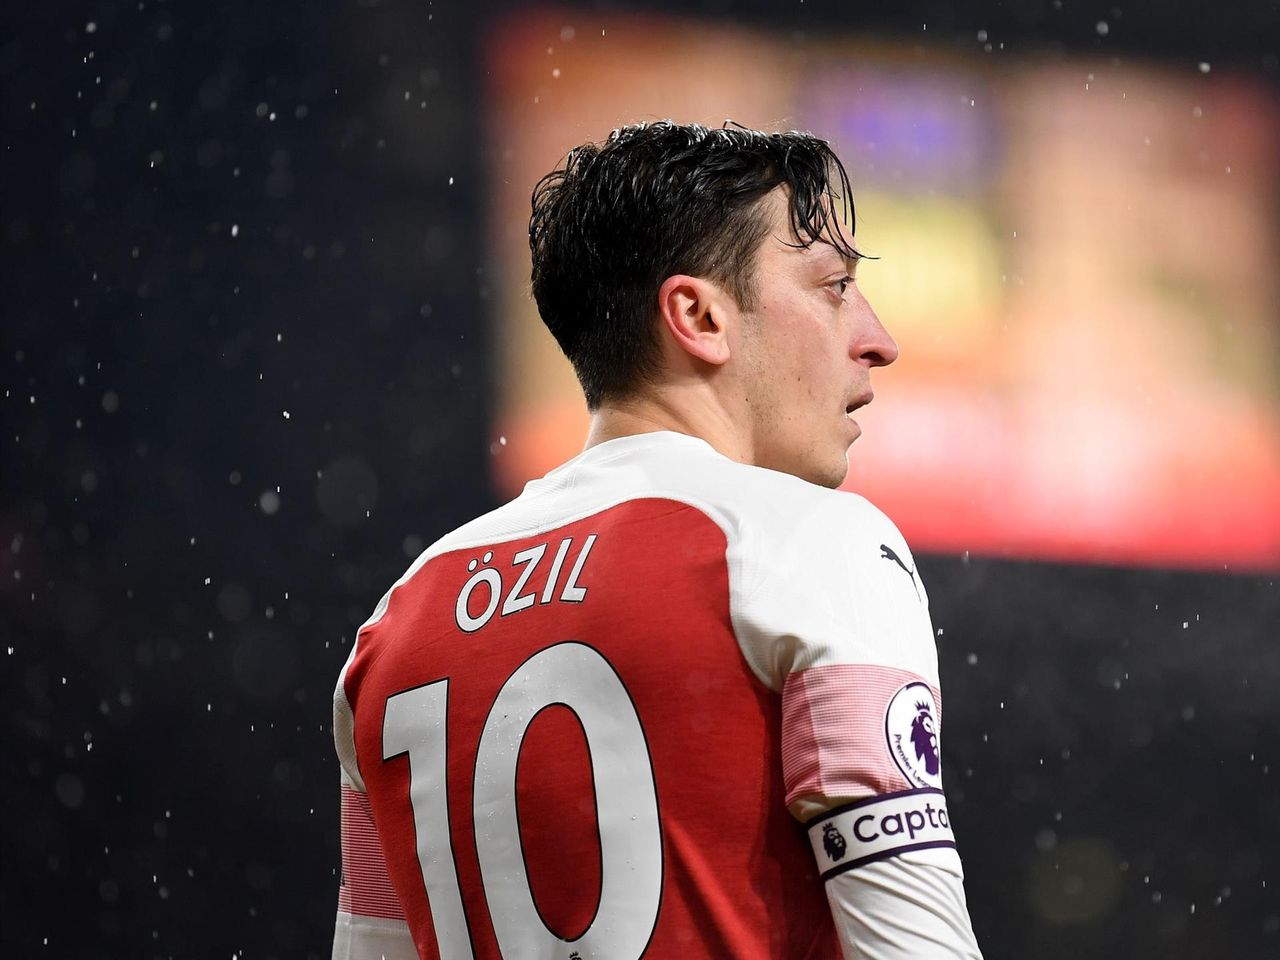 Transfers Mesut Ozil Als Ersatz Fur Neymar Bei Psg Das Sagt Der Arsenal Star Eurosport